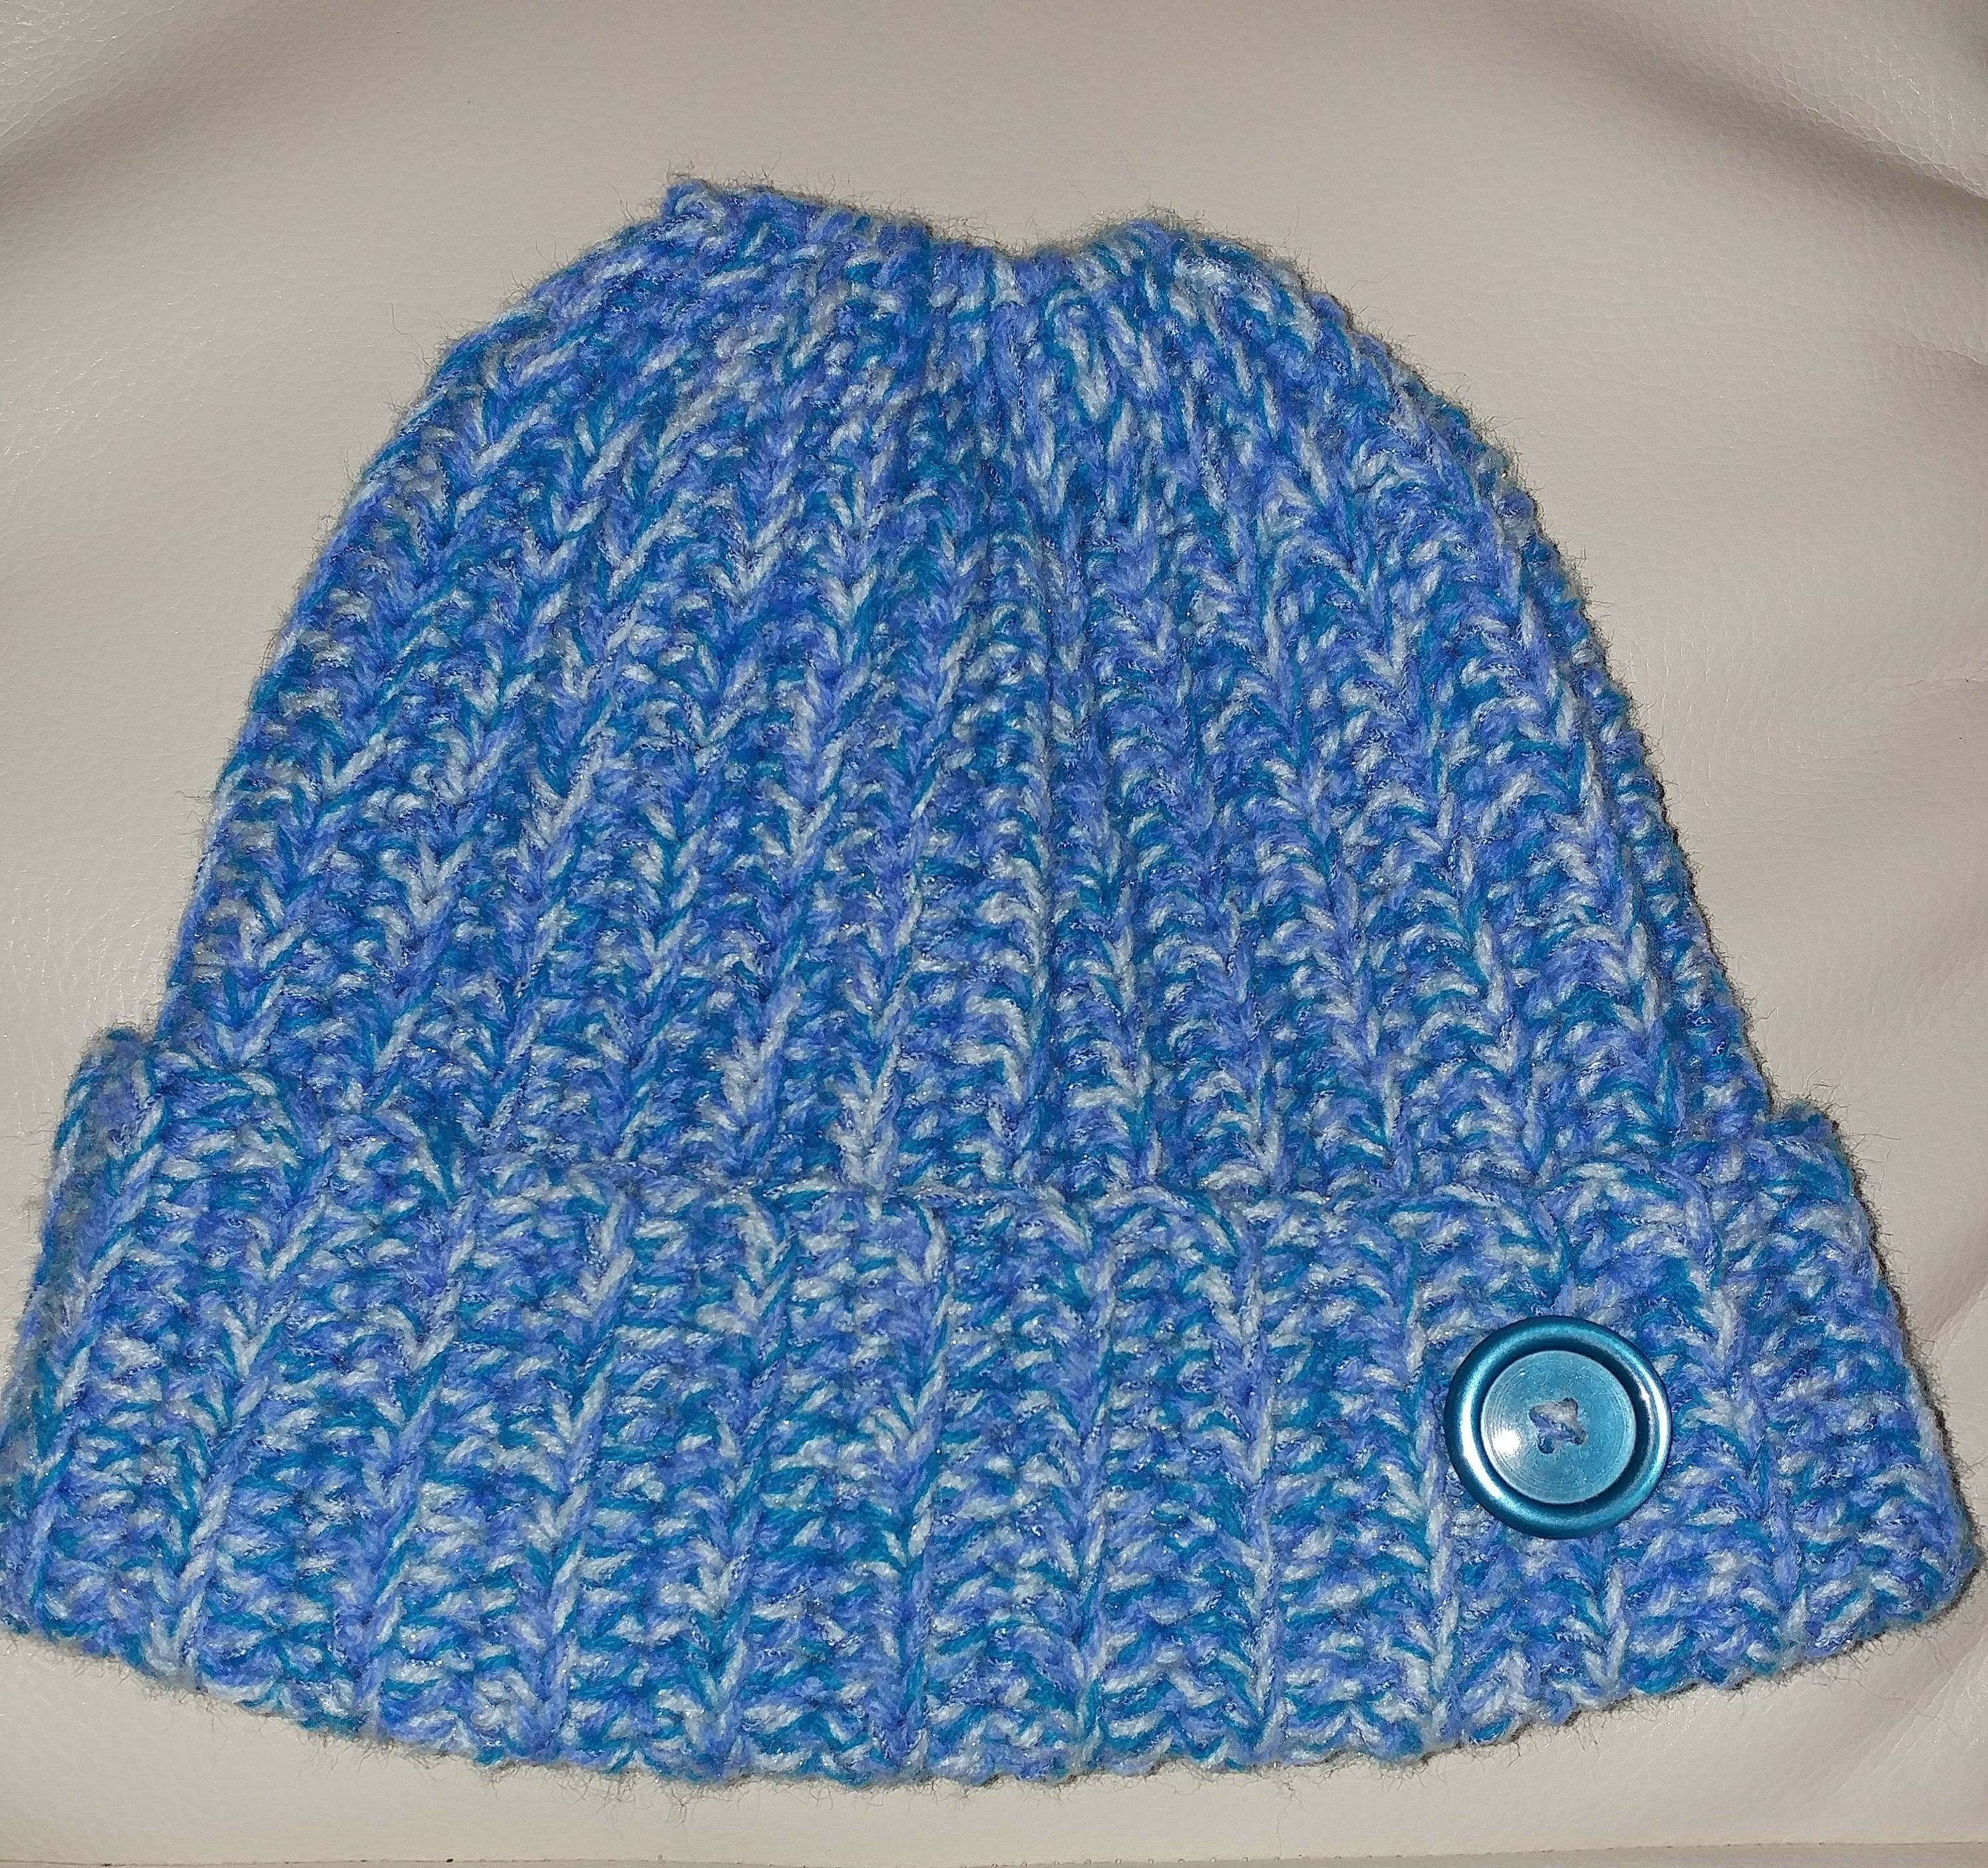 c7a4b6a41 Crochet holey hat in blue | Knit/Crochet - My Knits | Pinterest ...